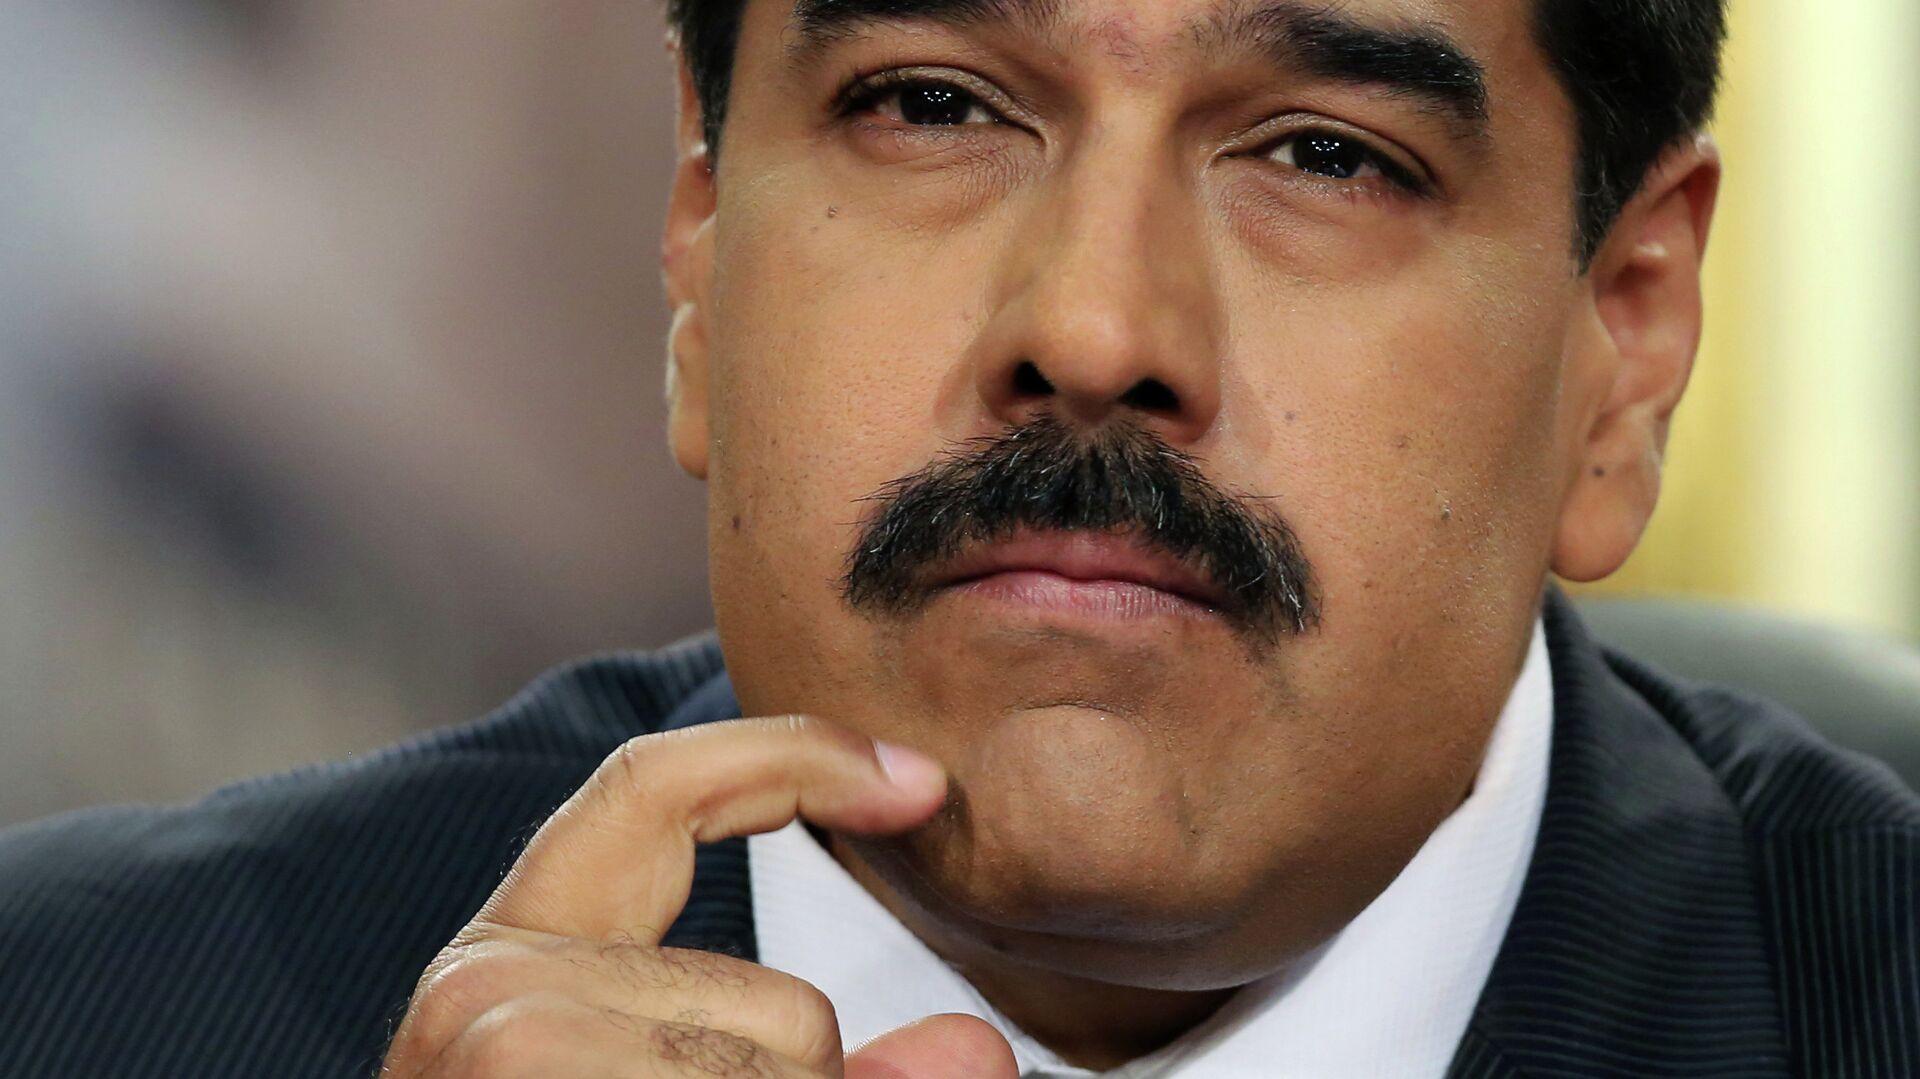 Venezuela's President Nicolas Maduro pauses during his speech at a press conference at Miraflores Presidential Palace in Caracas, Venezuela, Tuesday, Dec. 30, 2014 - Sputnik Mundo, 1920, 23.09.2021